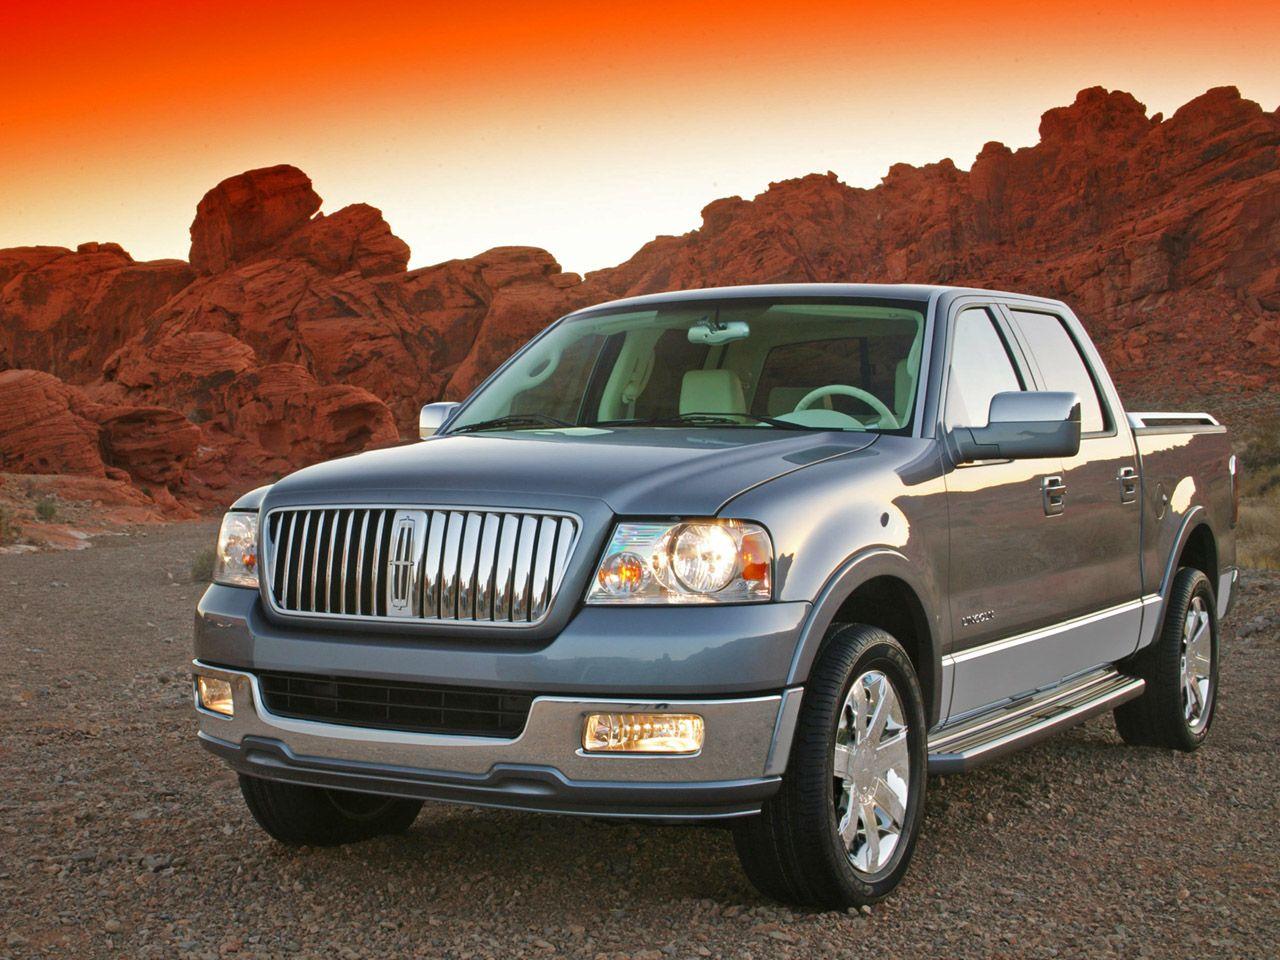 SouthwestEngines 2006 Lincoln Mark LT | Lincoln | Pinterest | Motorad